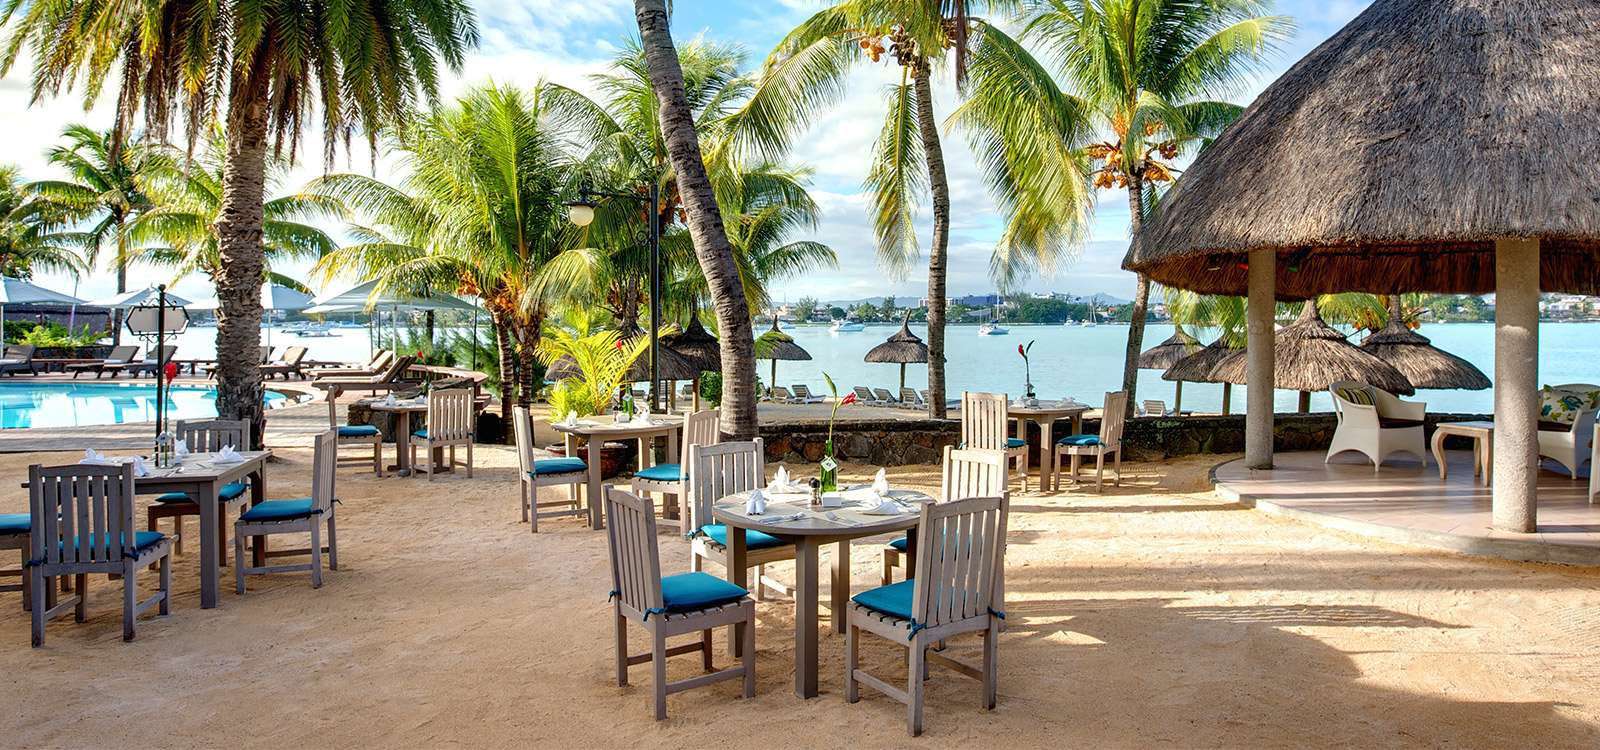 Veranda Hotel Grand Baie Ile Maurice